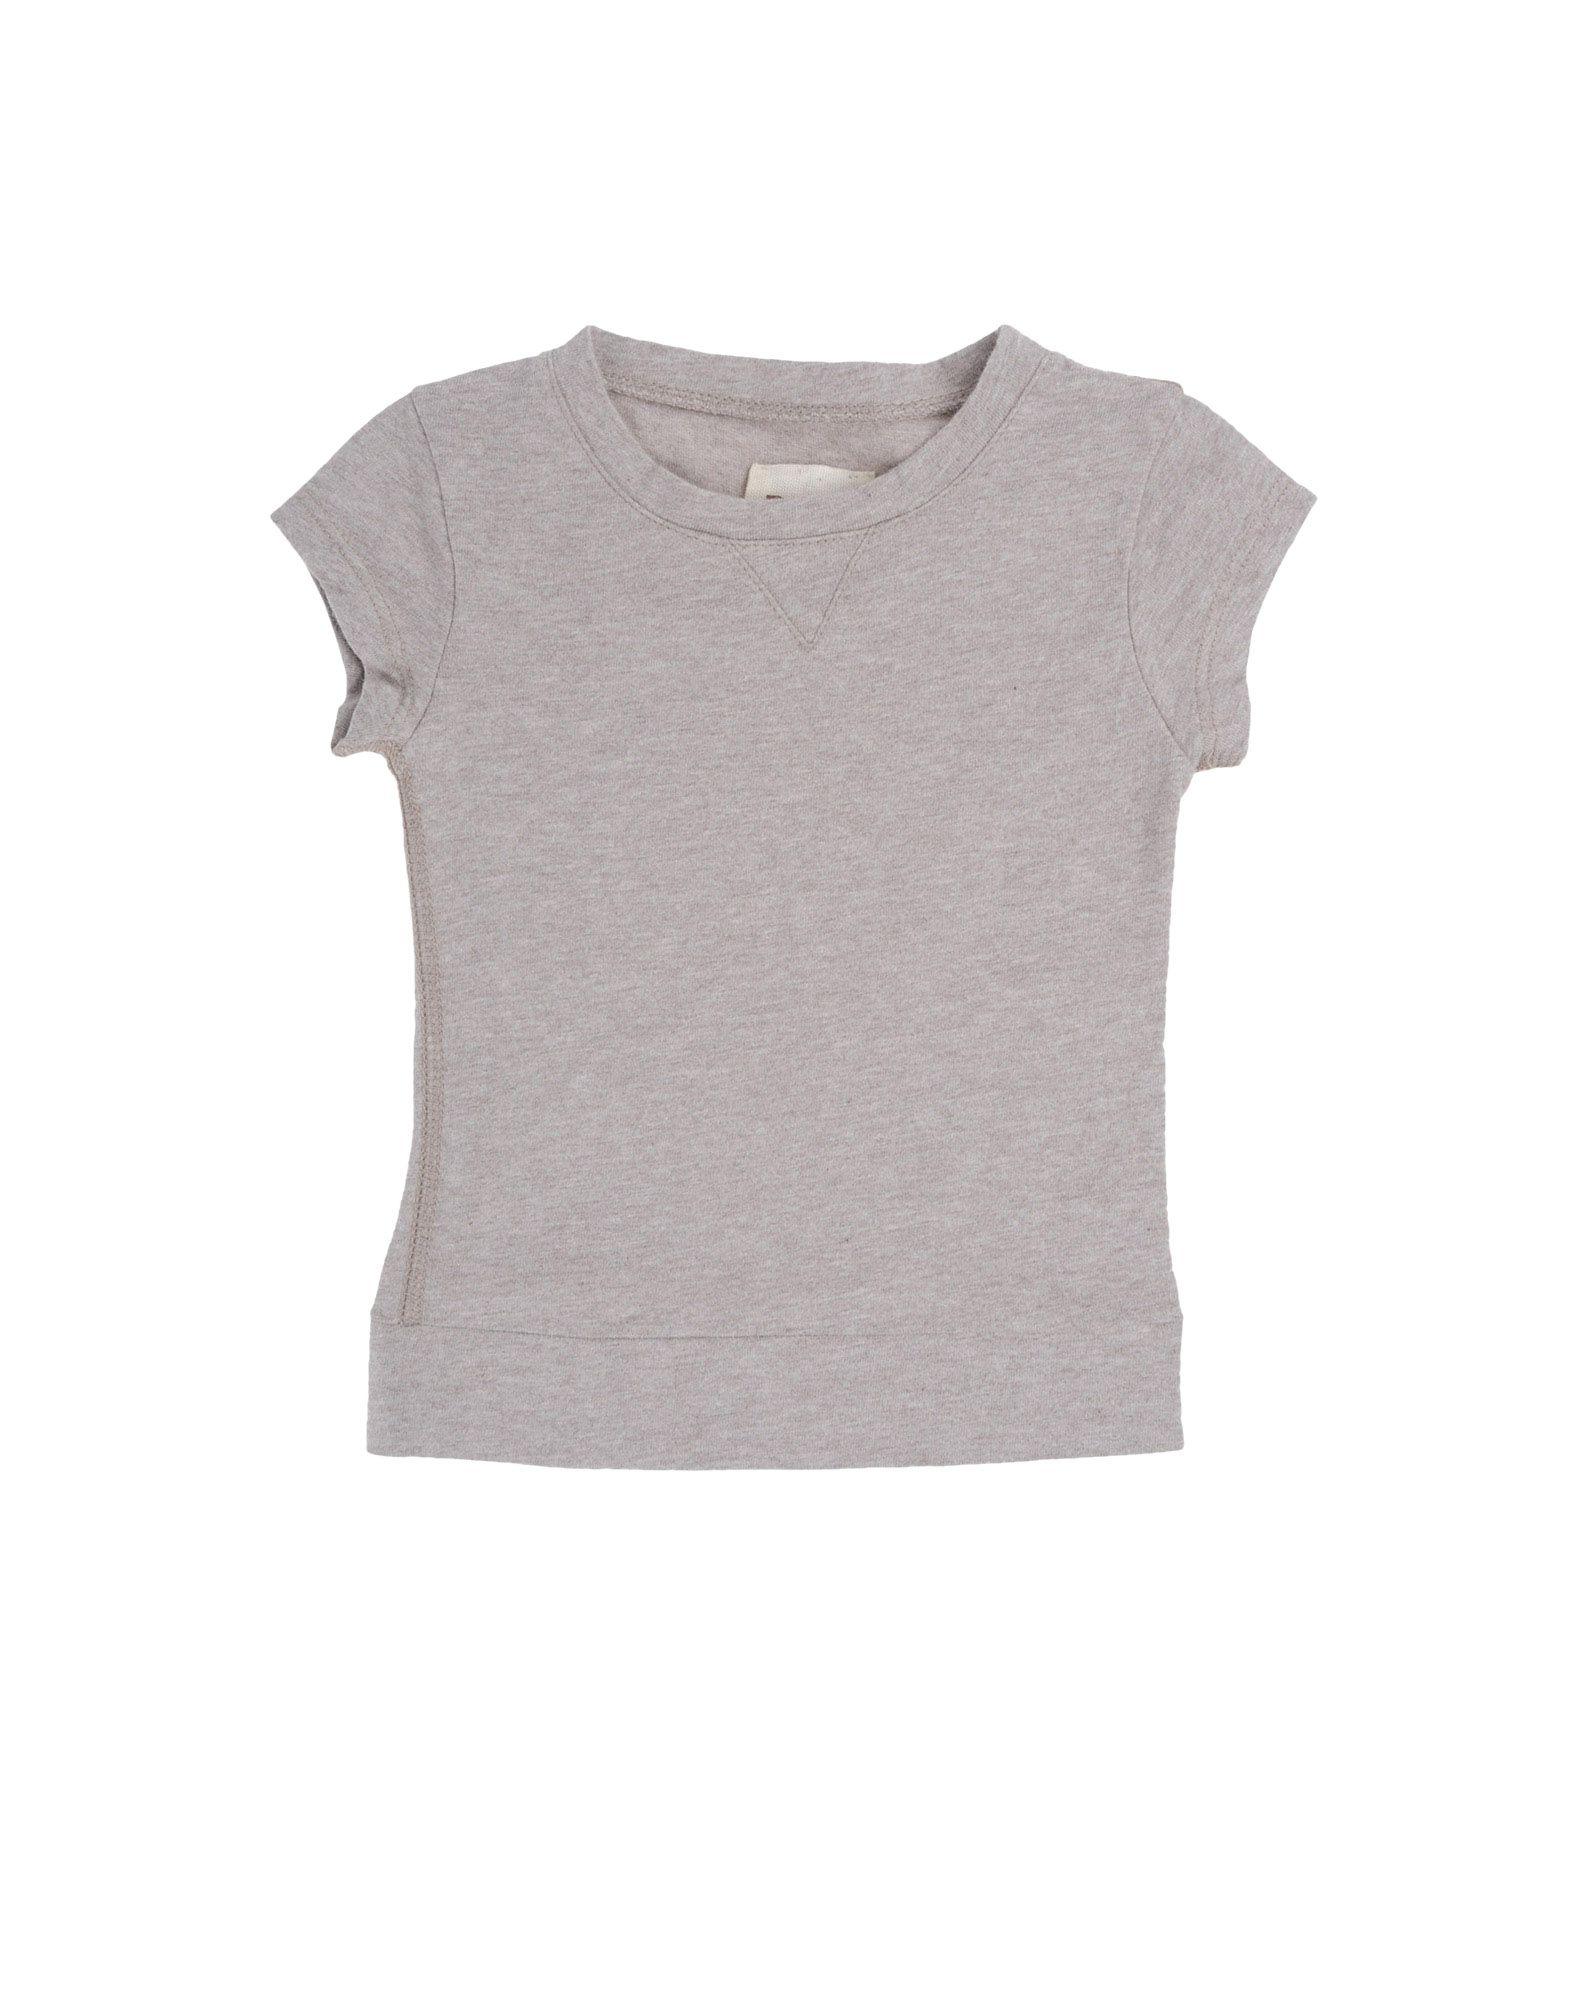 DOUUOD Mädchen 0-24 monate Kurzärmliges T-Shirt Farbe Taubengrau Größe 3